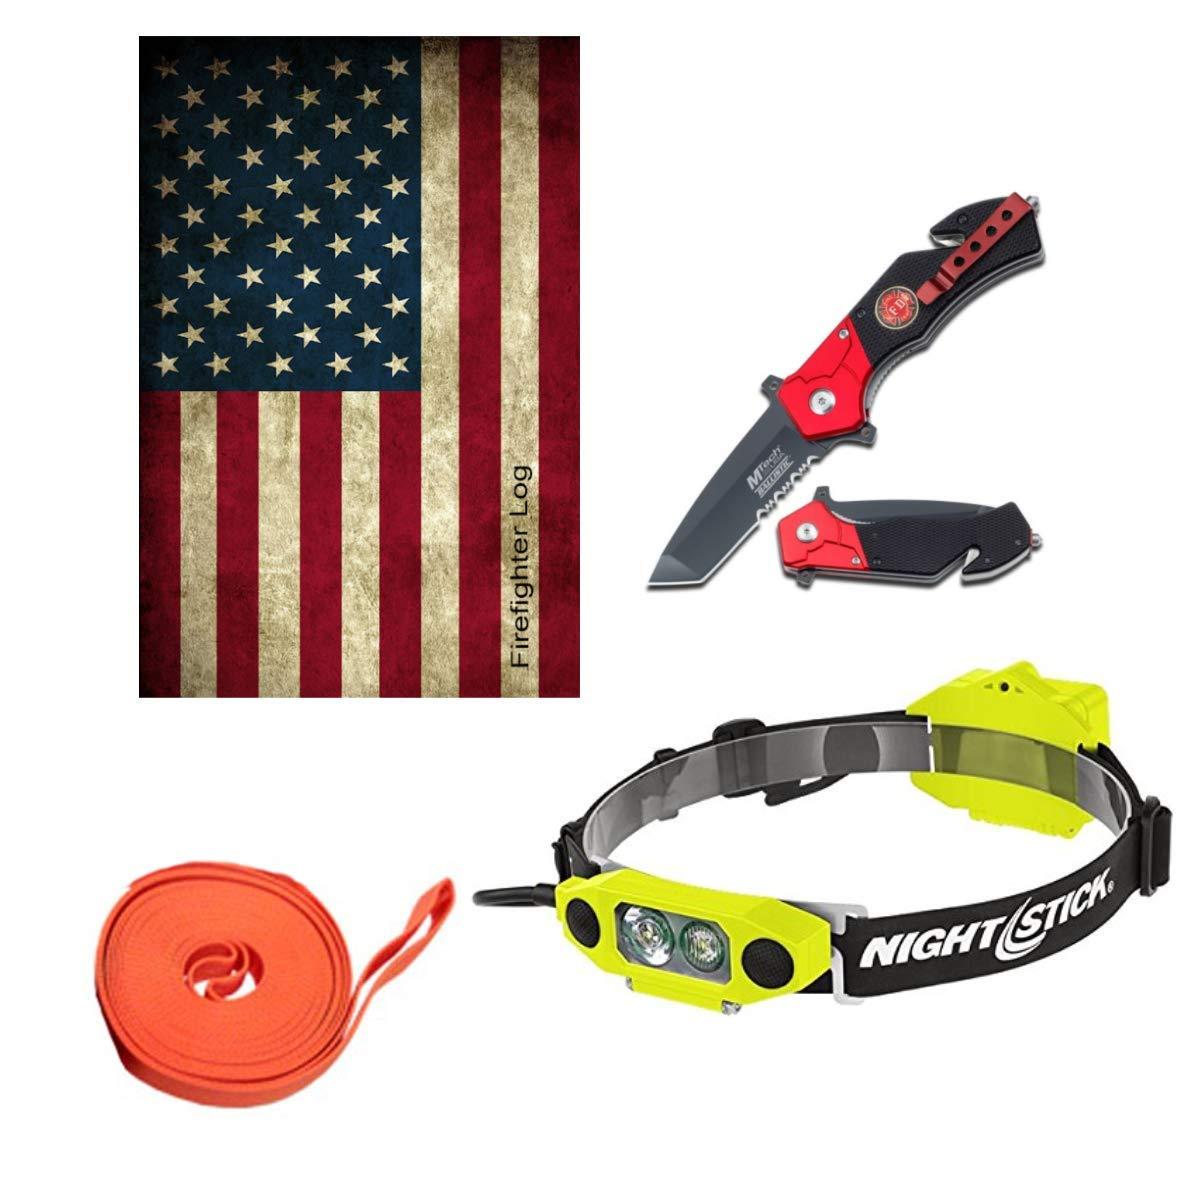 Tactical Flashlight Tools Firefighter Bundle- 1 - Tactical Light Headlamp | 1 - Tactical Knife | 1 - Drag Strap | 1 - Firefighter Log Book (Track training hours, Run activities, work, ect.)